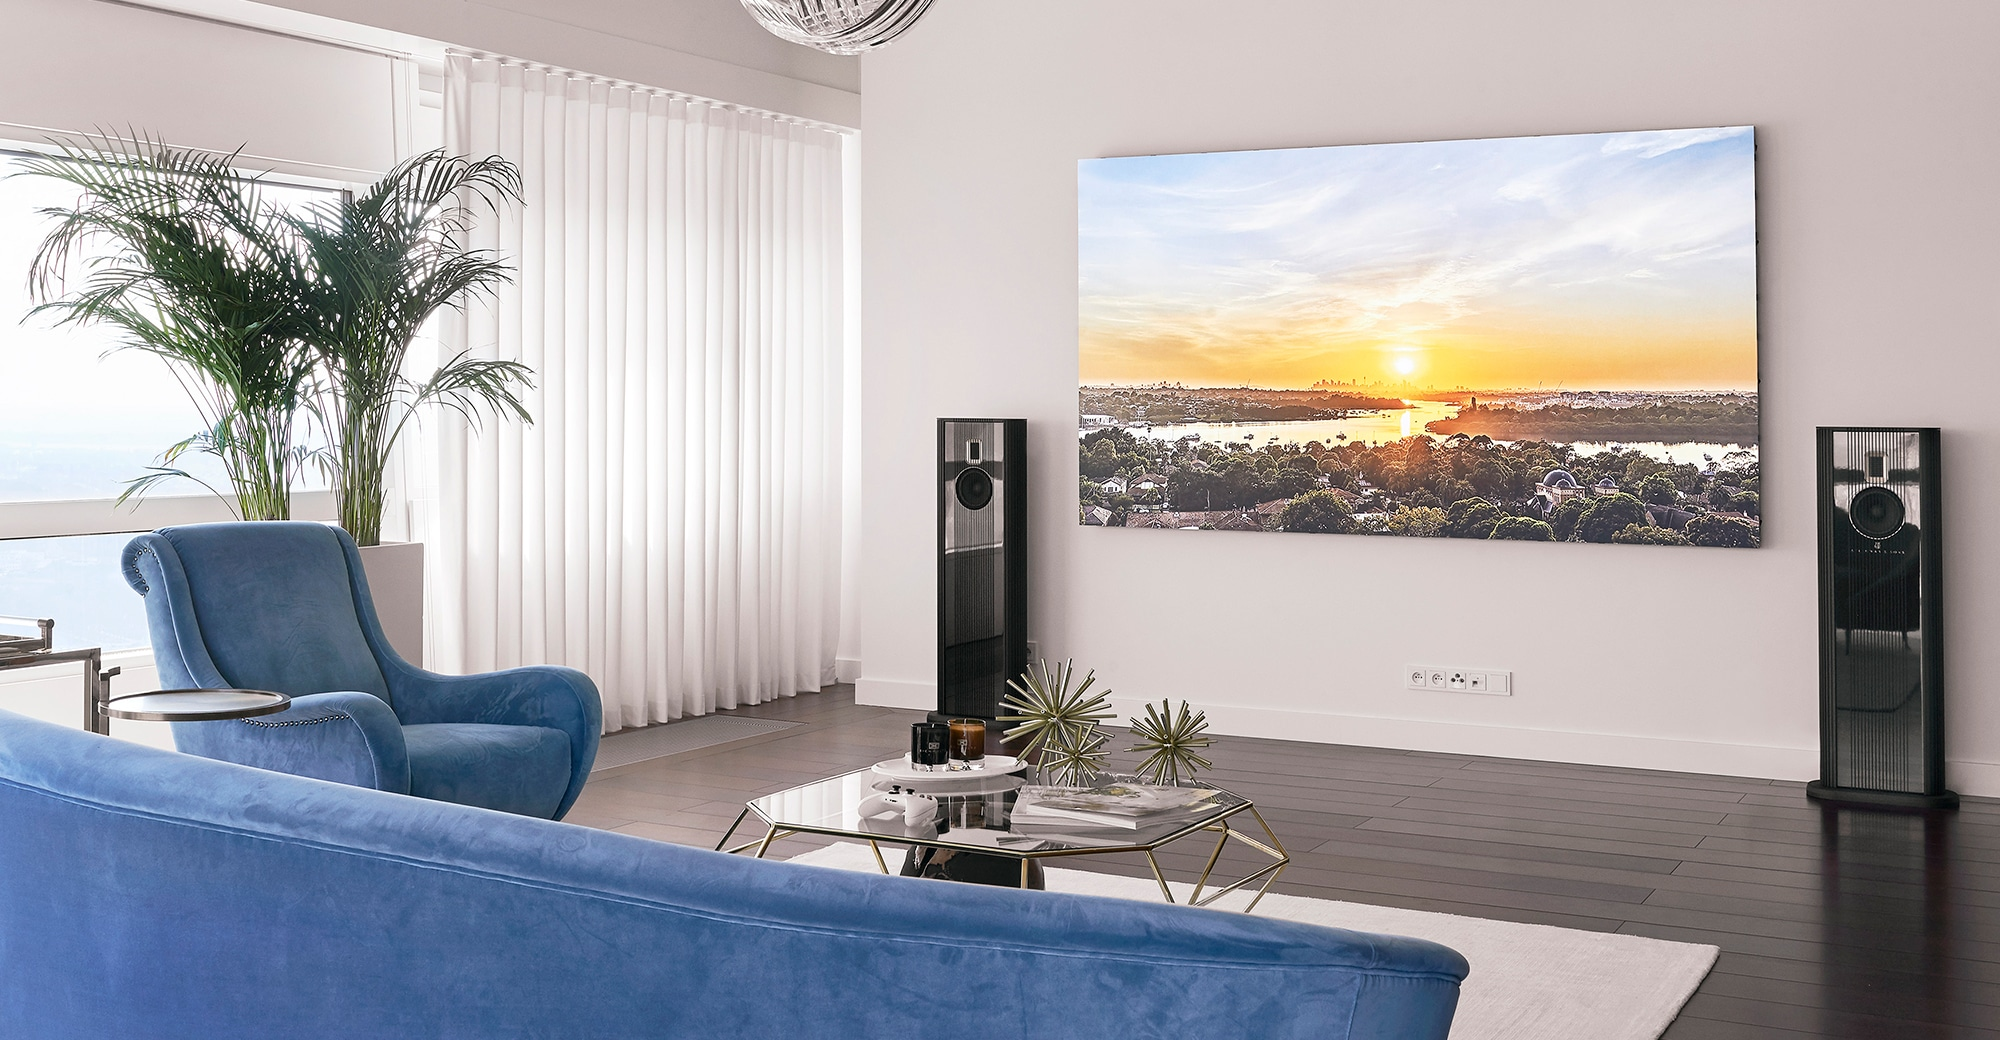 Model O in living room